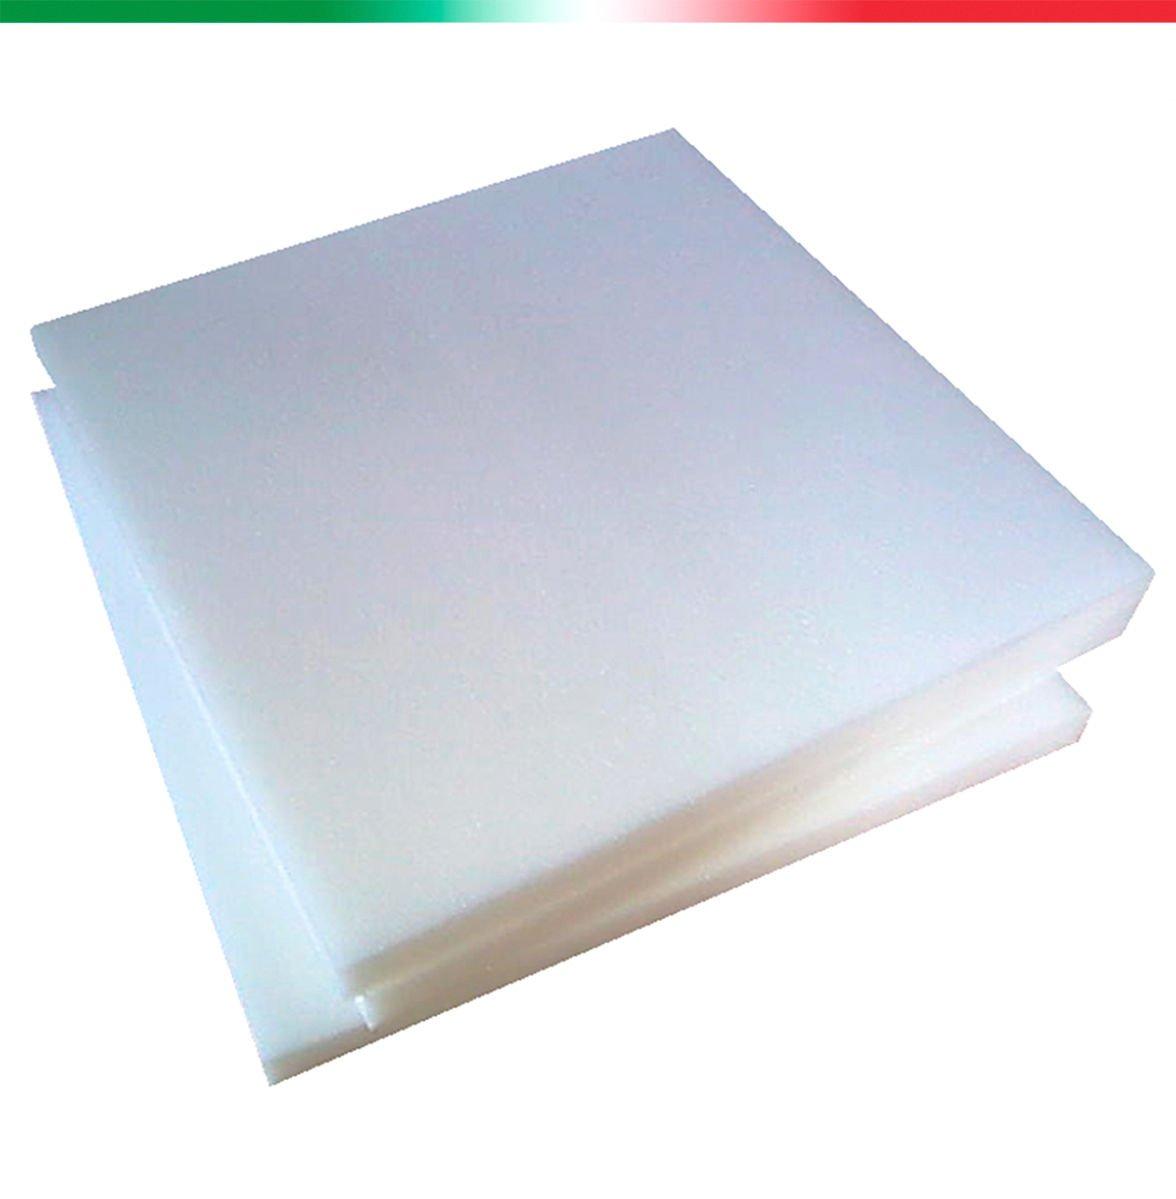 Emejing imbottitura per divani pictures acrylicgiftware - Imbottitura divani poliuretano ...